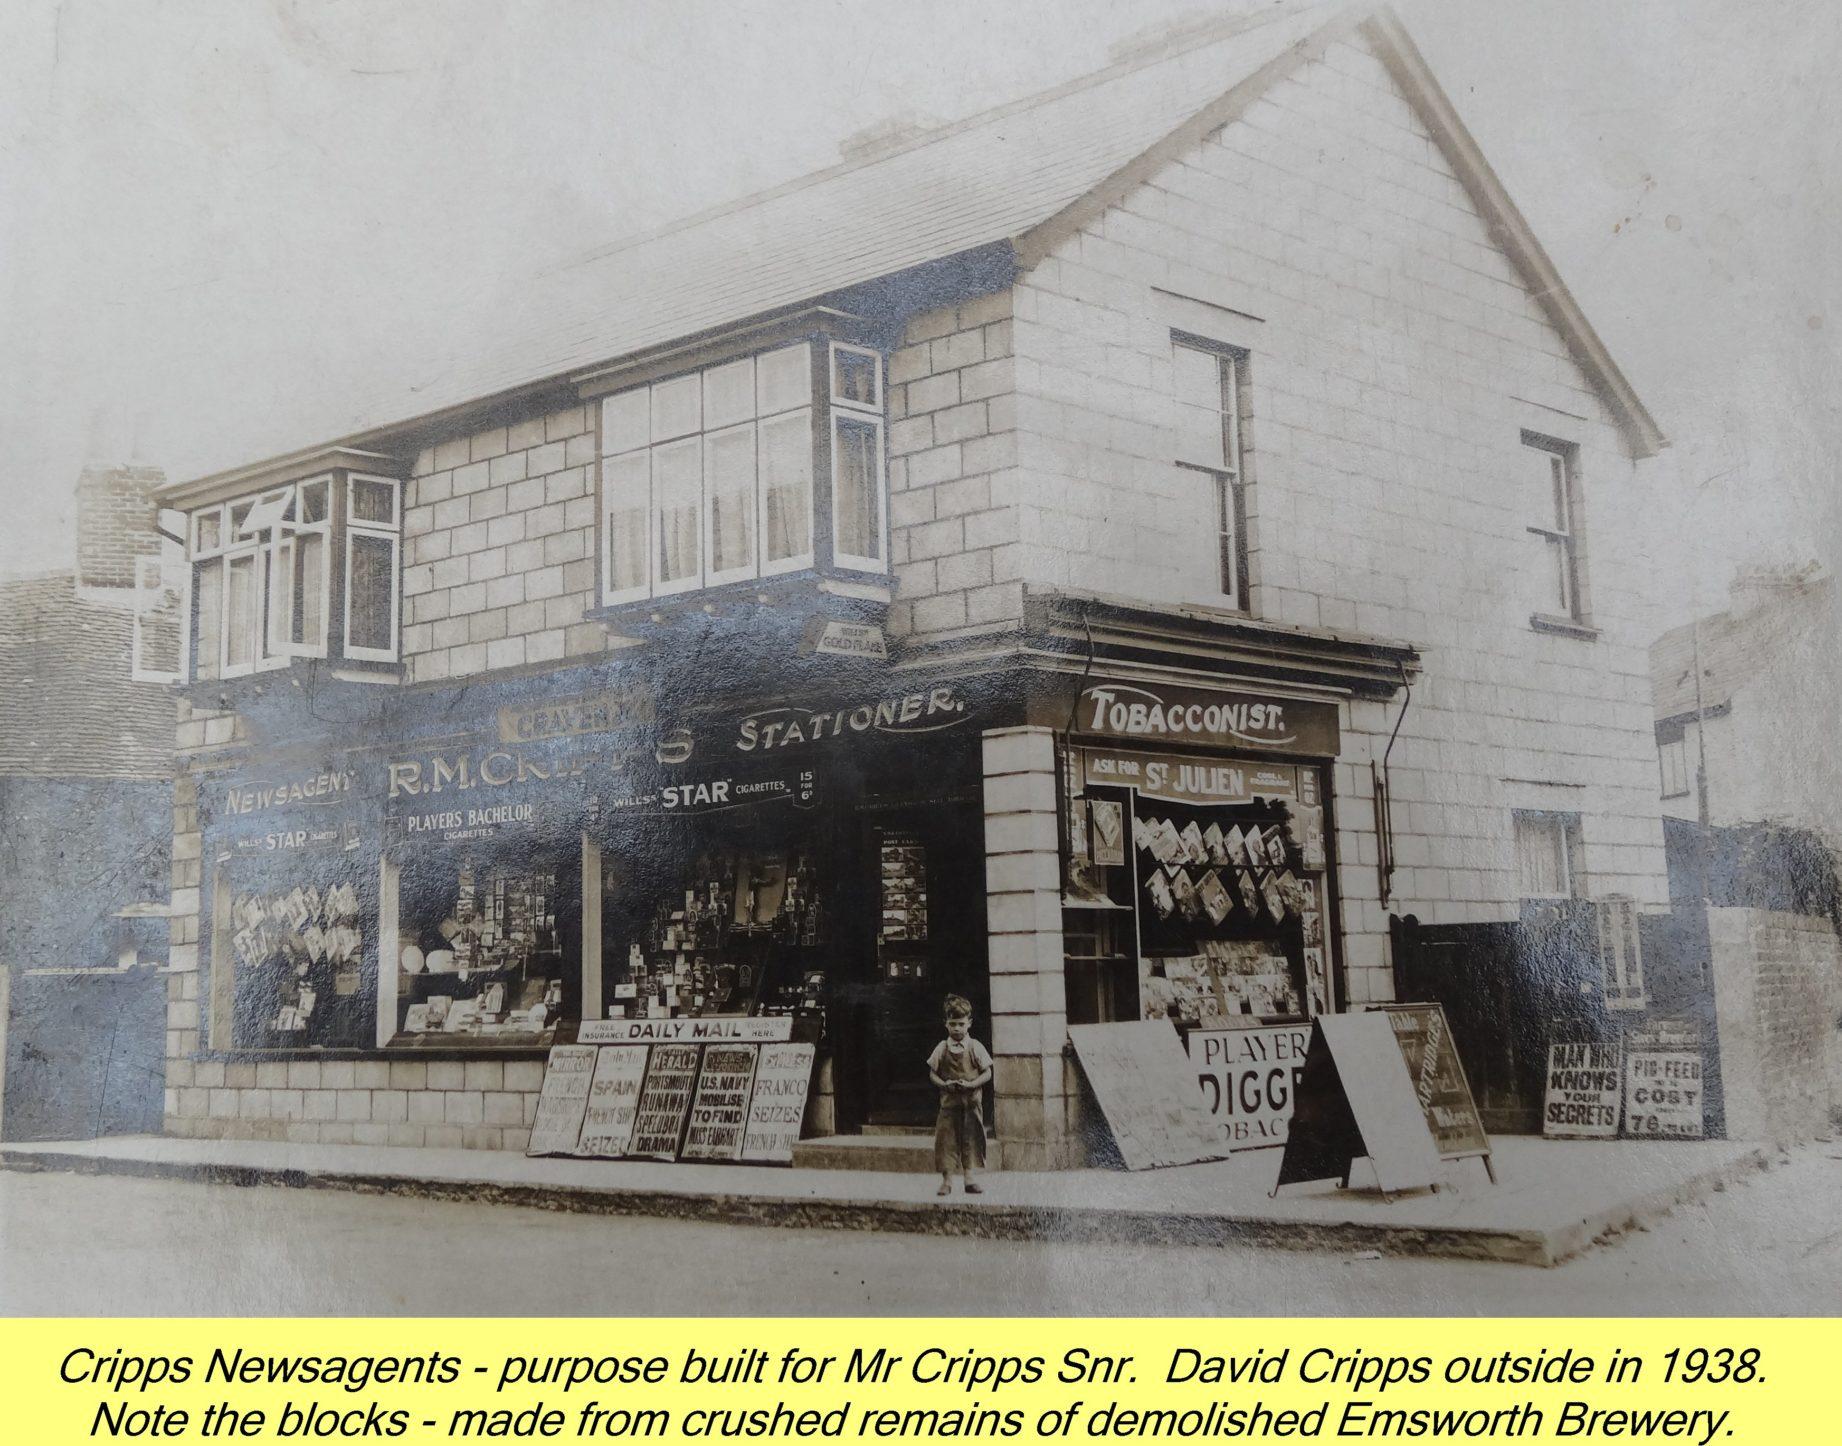 WESTBOURNE HISTORY PHOTO, CRIPPS, NEWSAGENT, NORTH STREET, EMSWORTH BREWERY